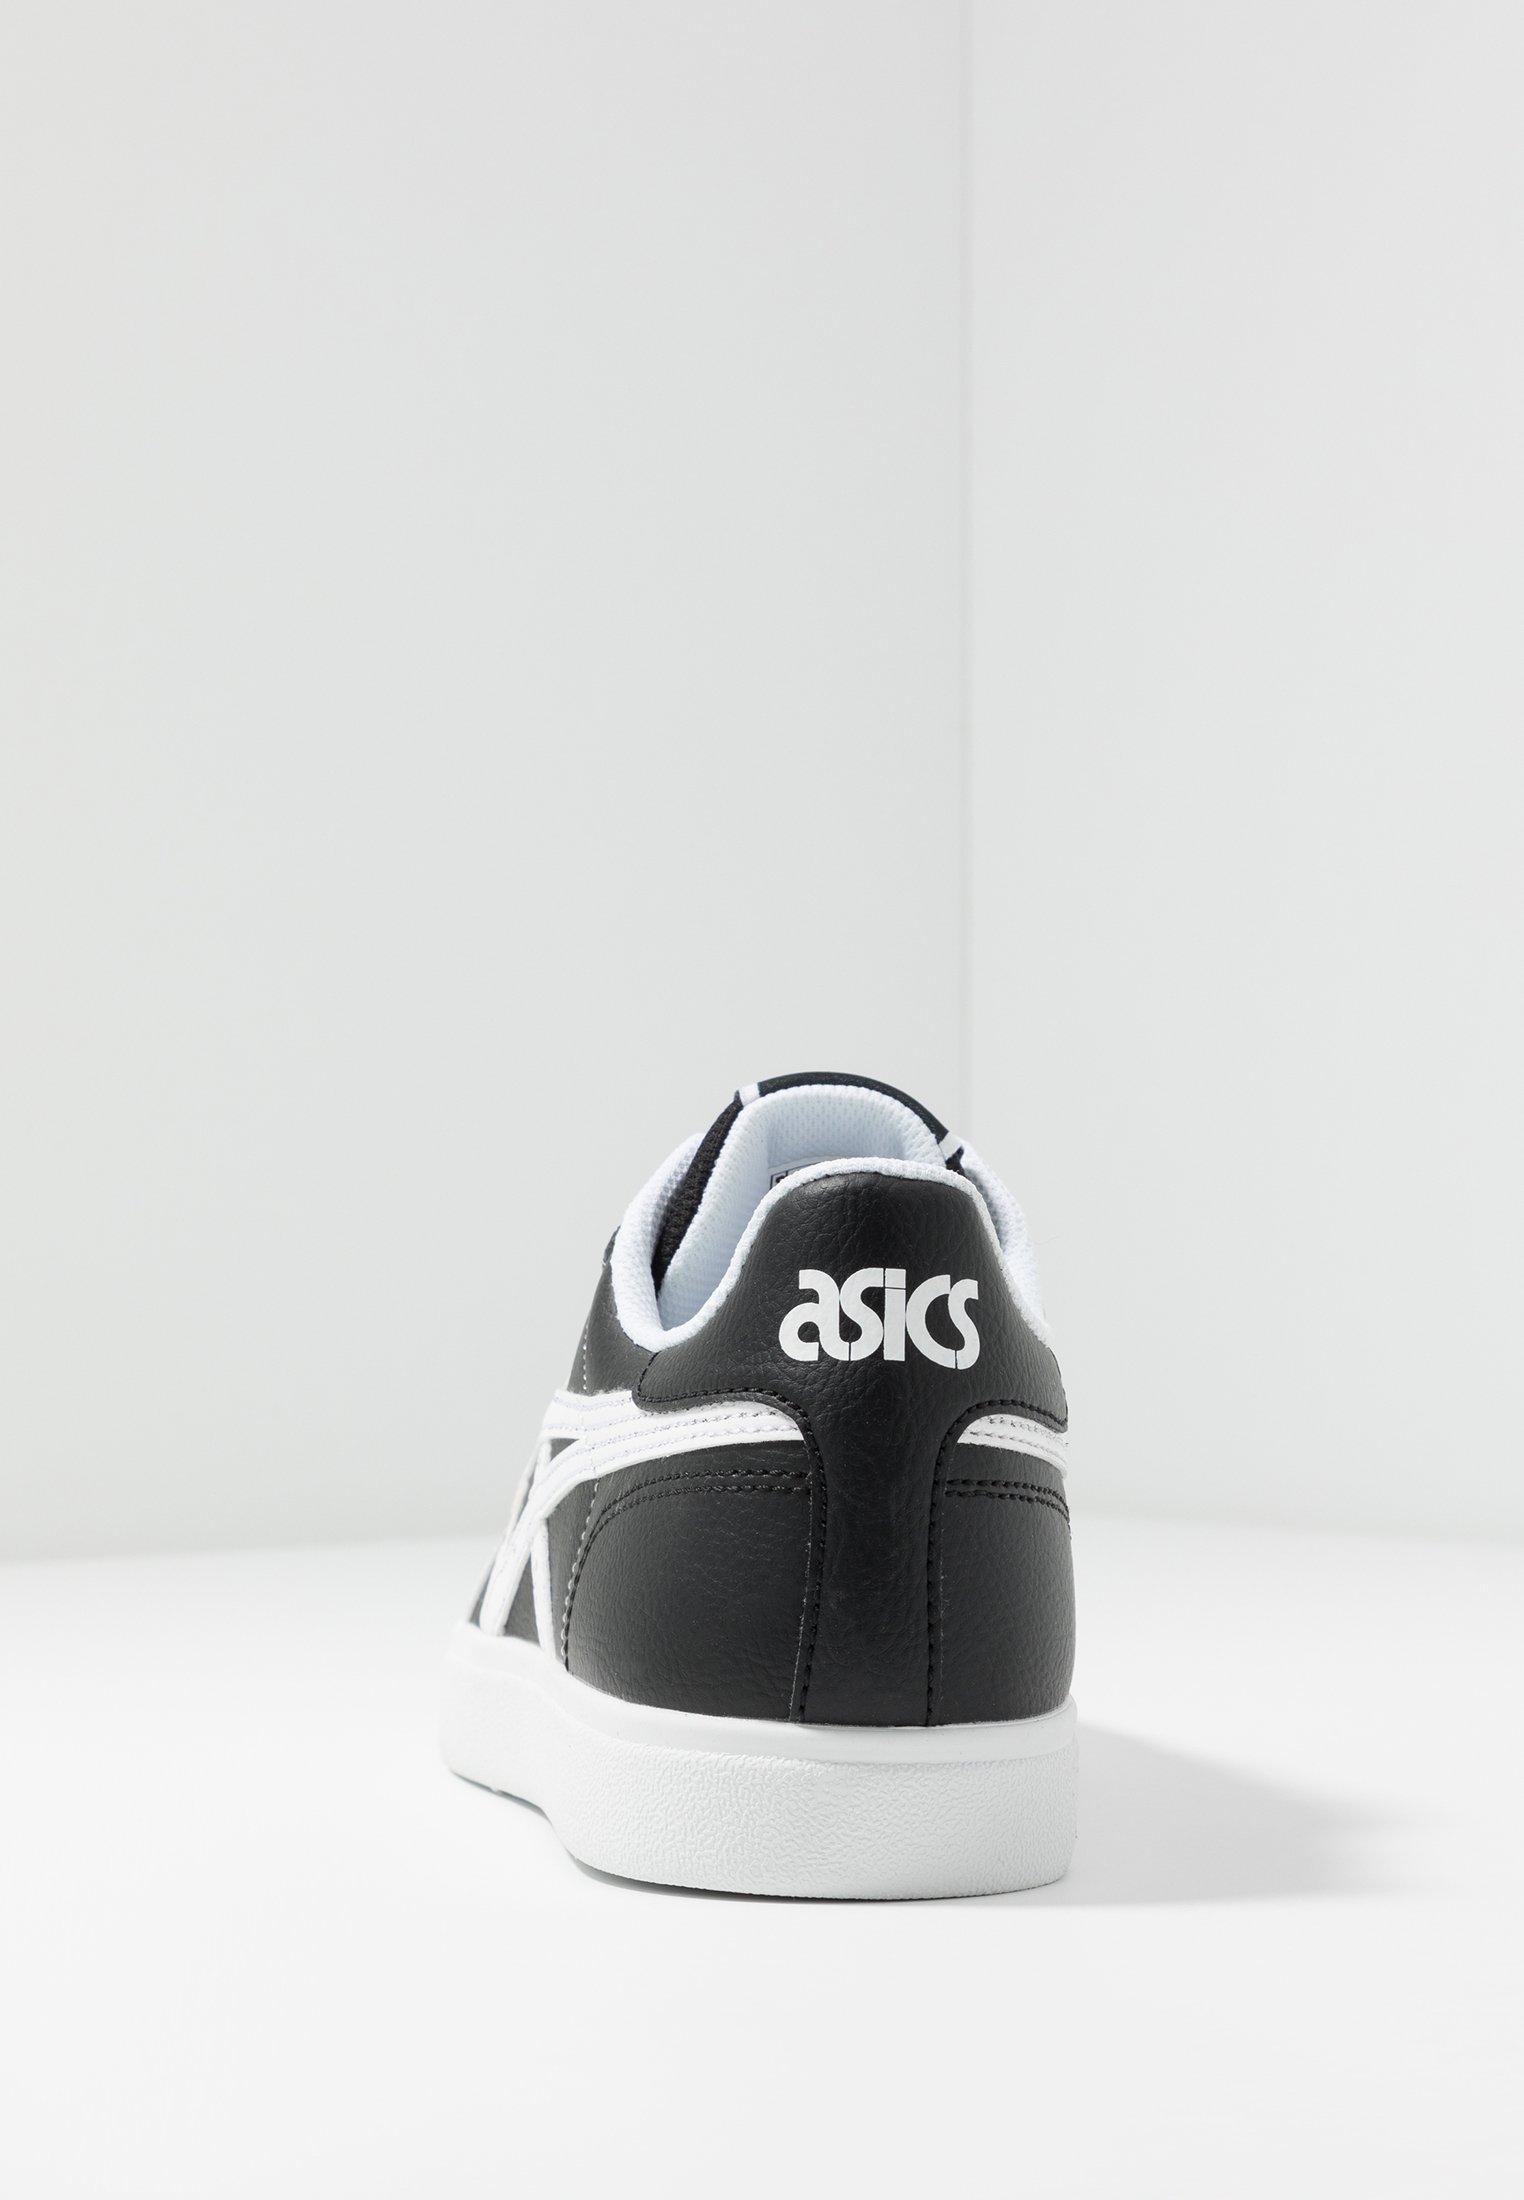 Asics Sportstyle Classic - Baskets Basses Black/white